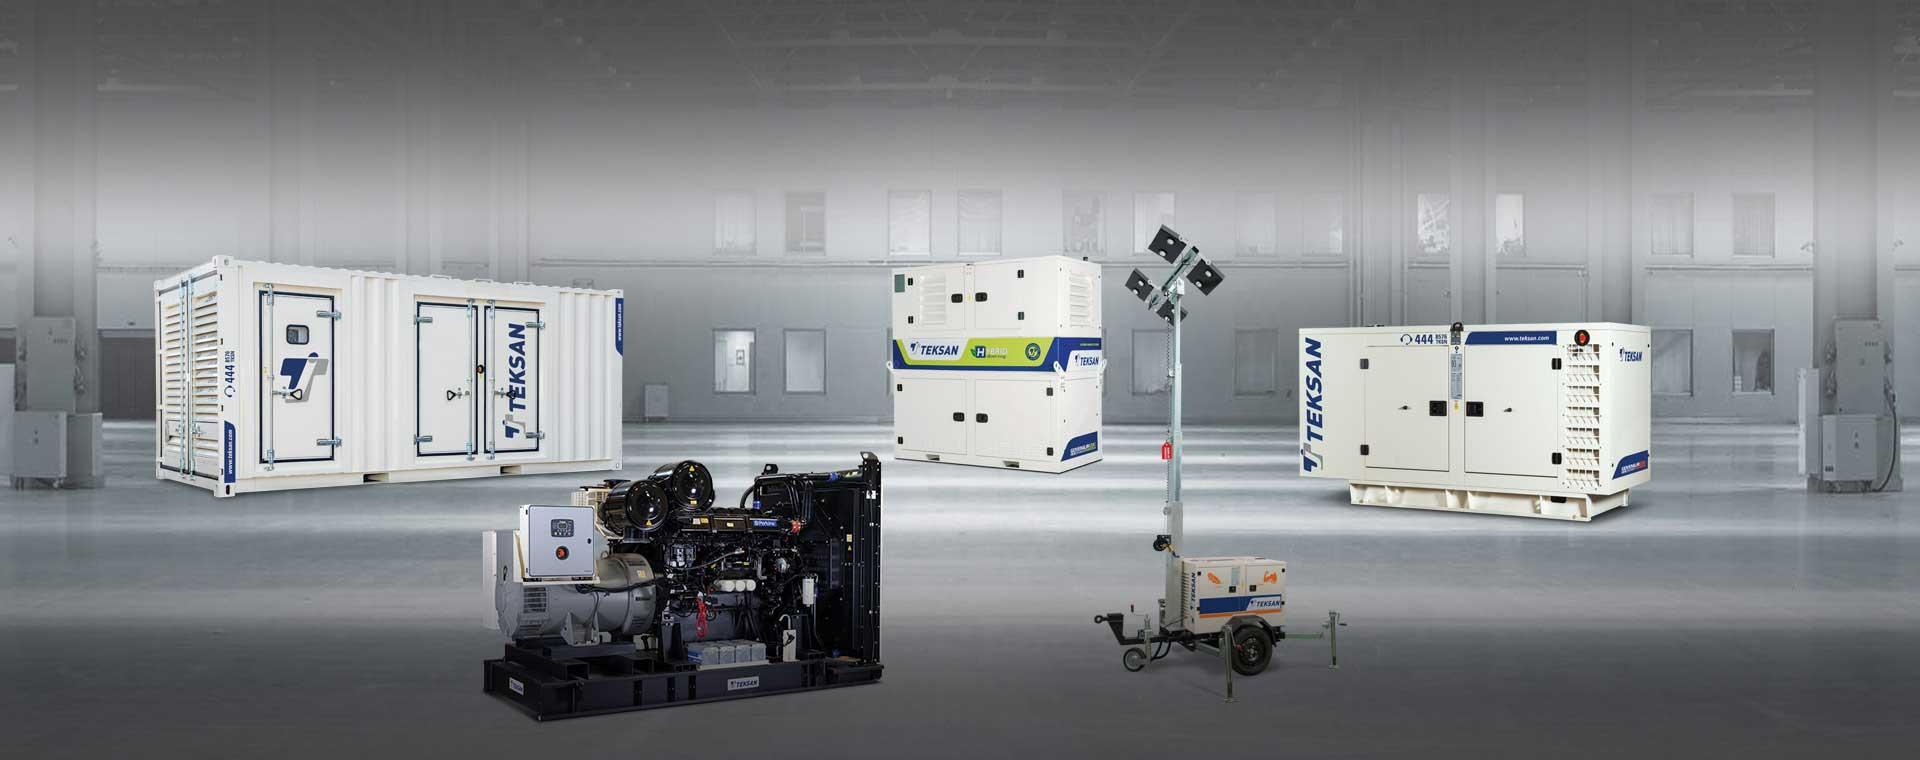 main components of a generator set | generators | diesel gensets | hybrid  generator | teksan generator